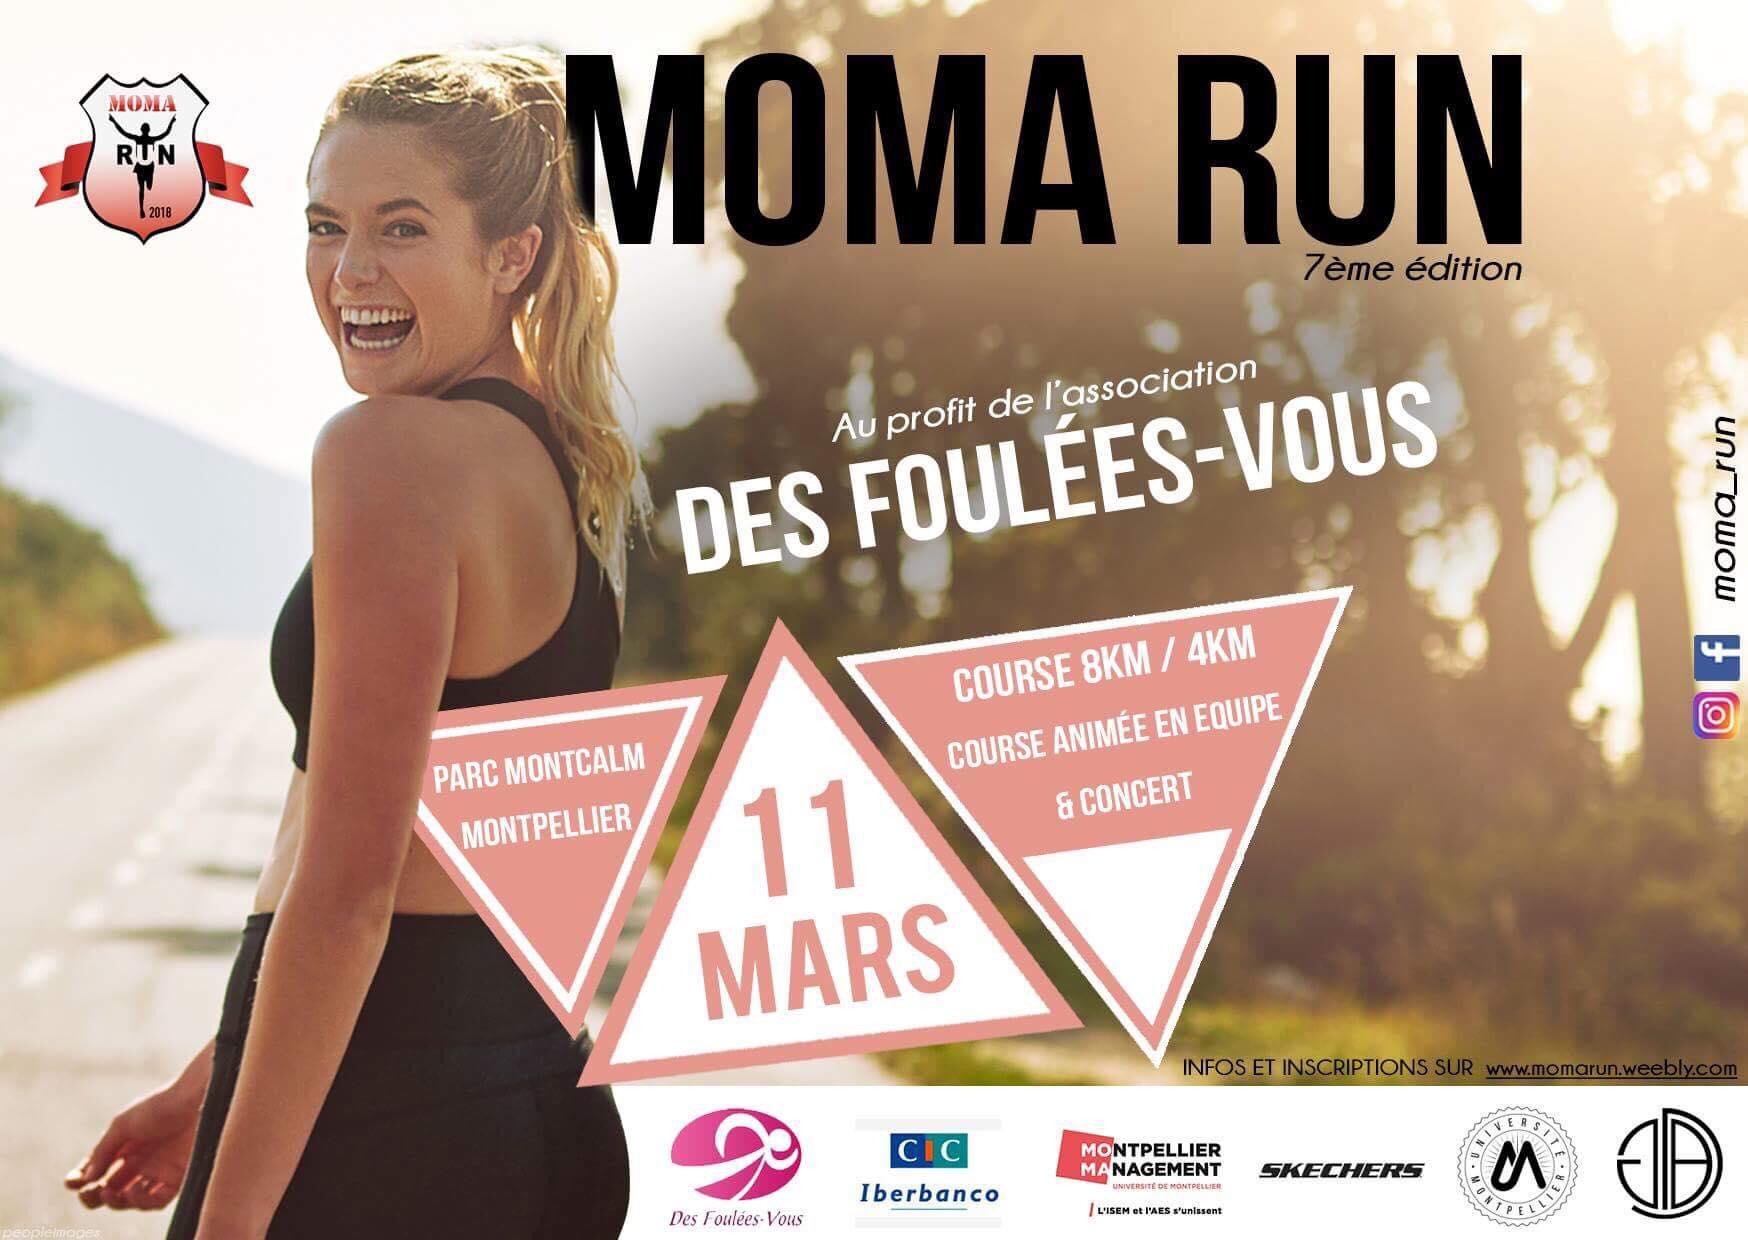 Moma-Run_Montpellier-Management